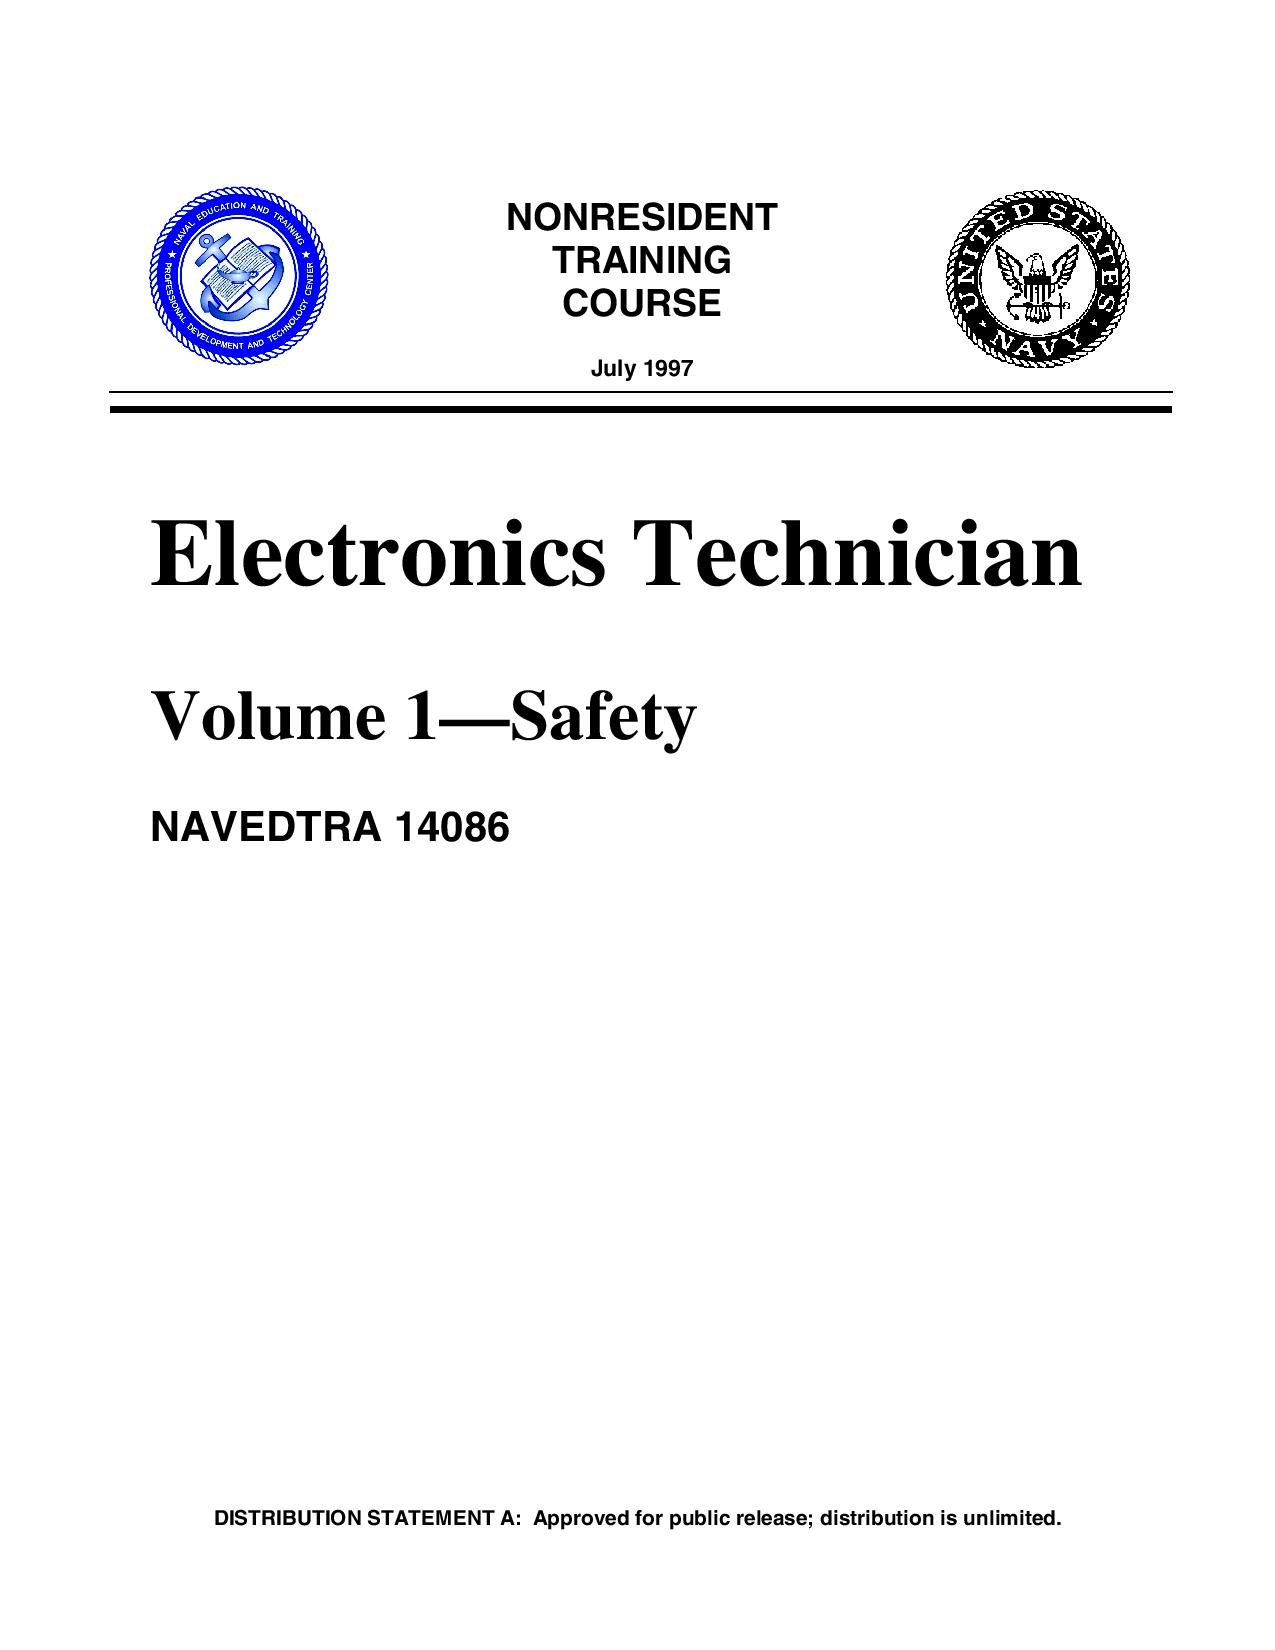 Electronics Technician Volume 1